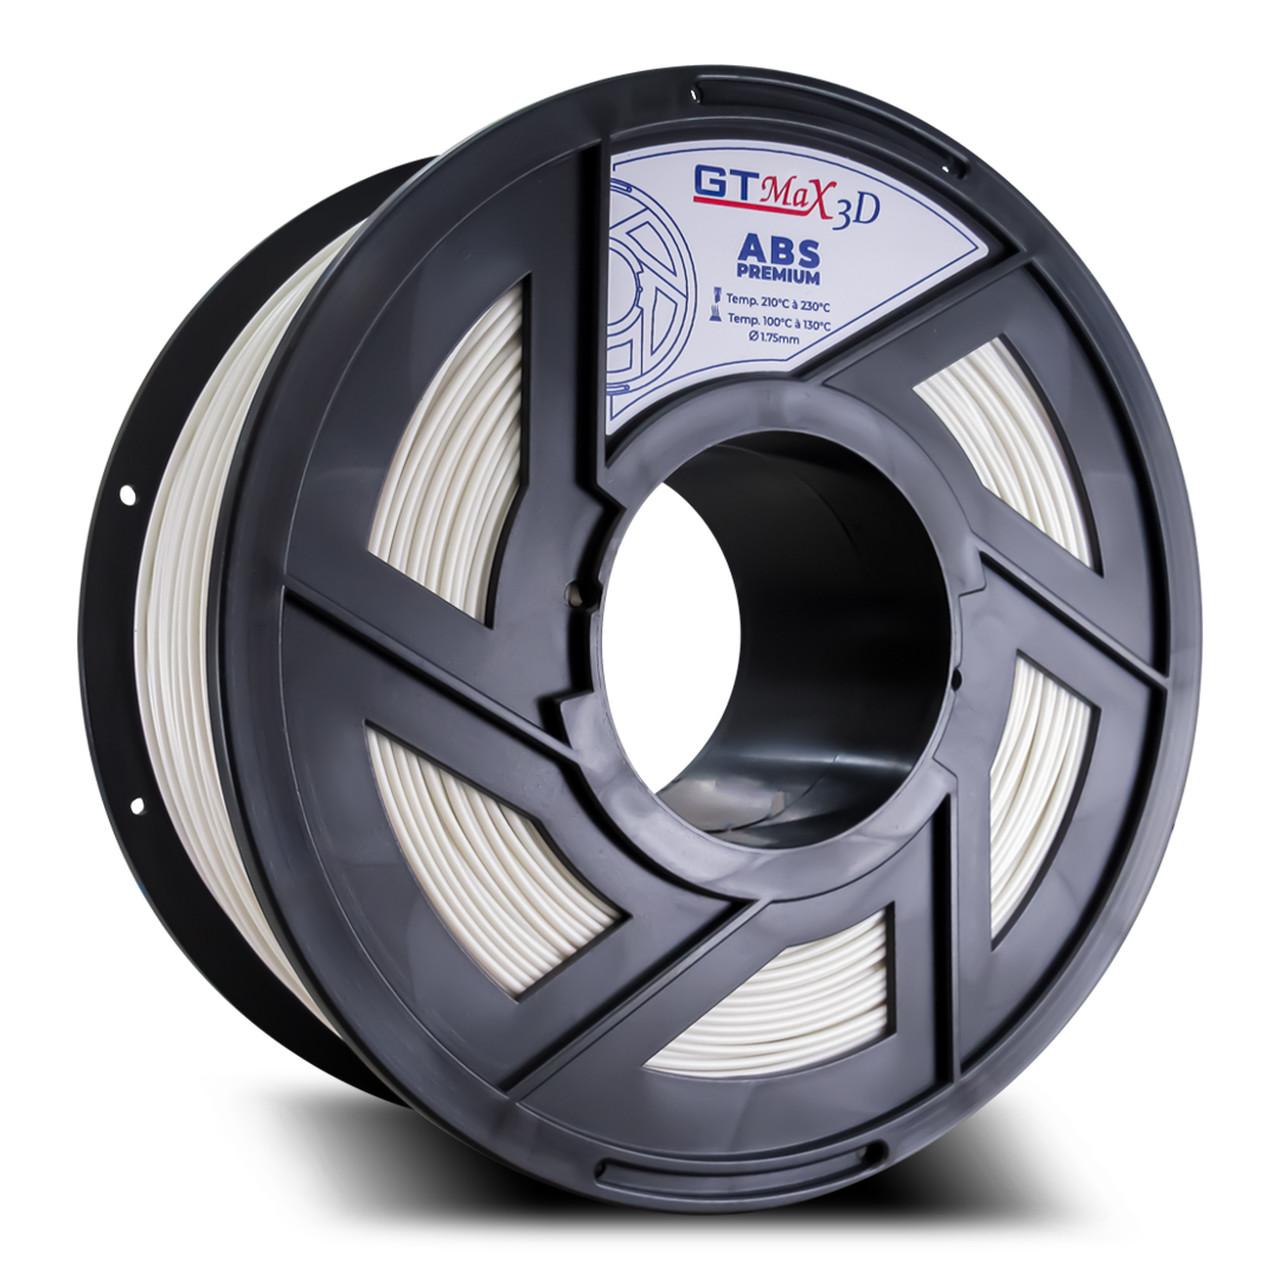 Filamento ABS - Branco - Premium - GTMax 3D - 1.75mm - 1KG